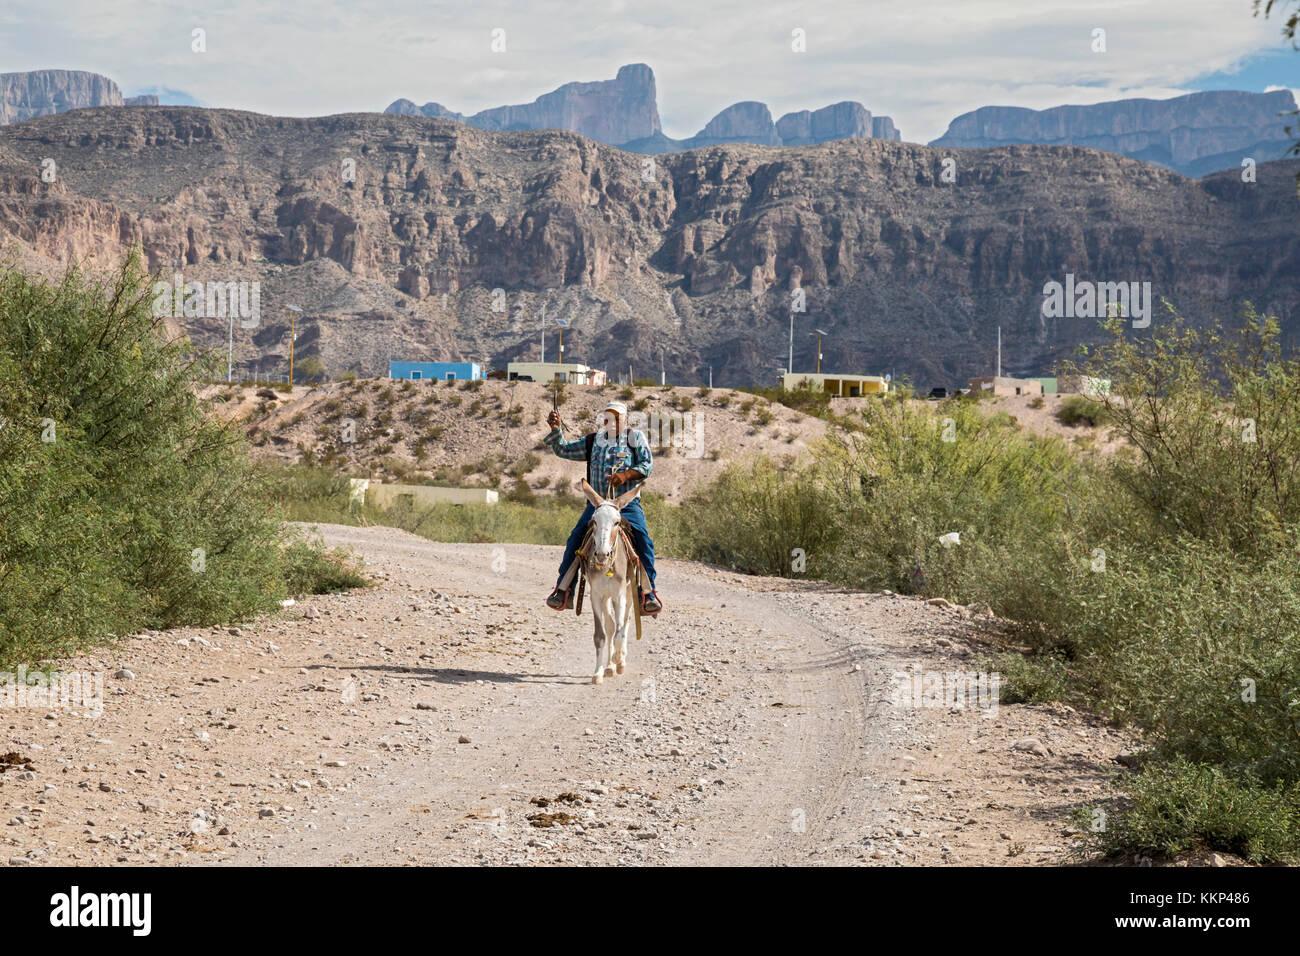 Boquillas del Carmen, Coahuila, Mexico - Esteban Oñate rides a burro from the town of Boquillas to the nearby - Stock Image